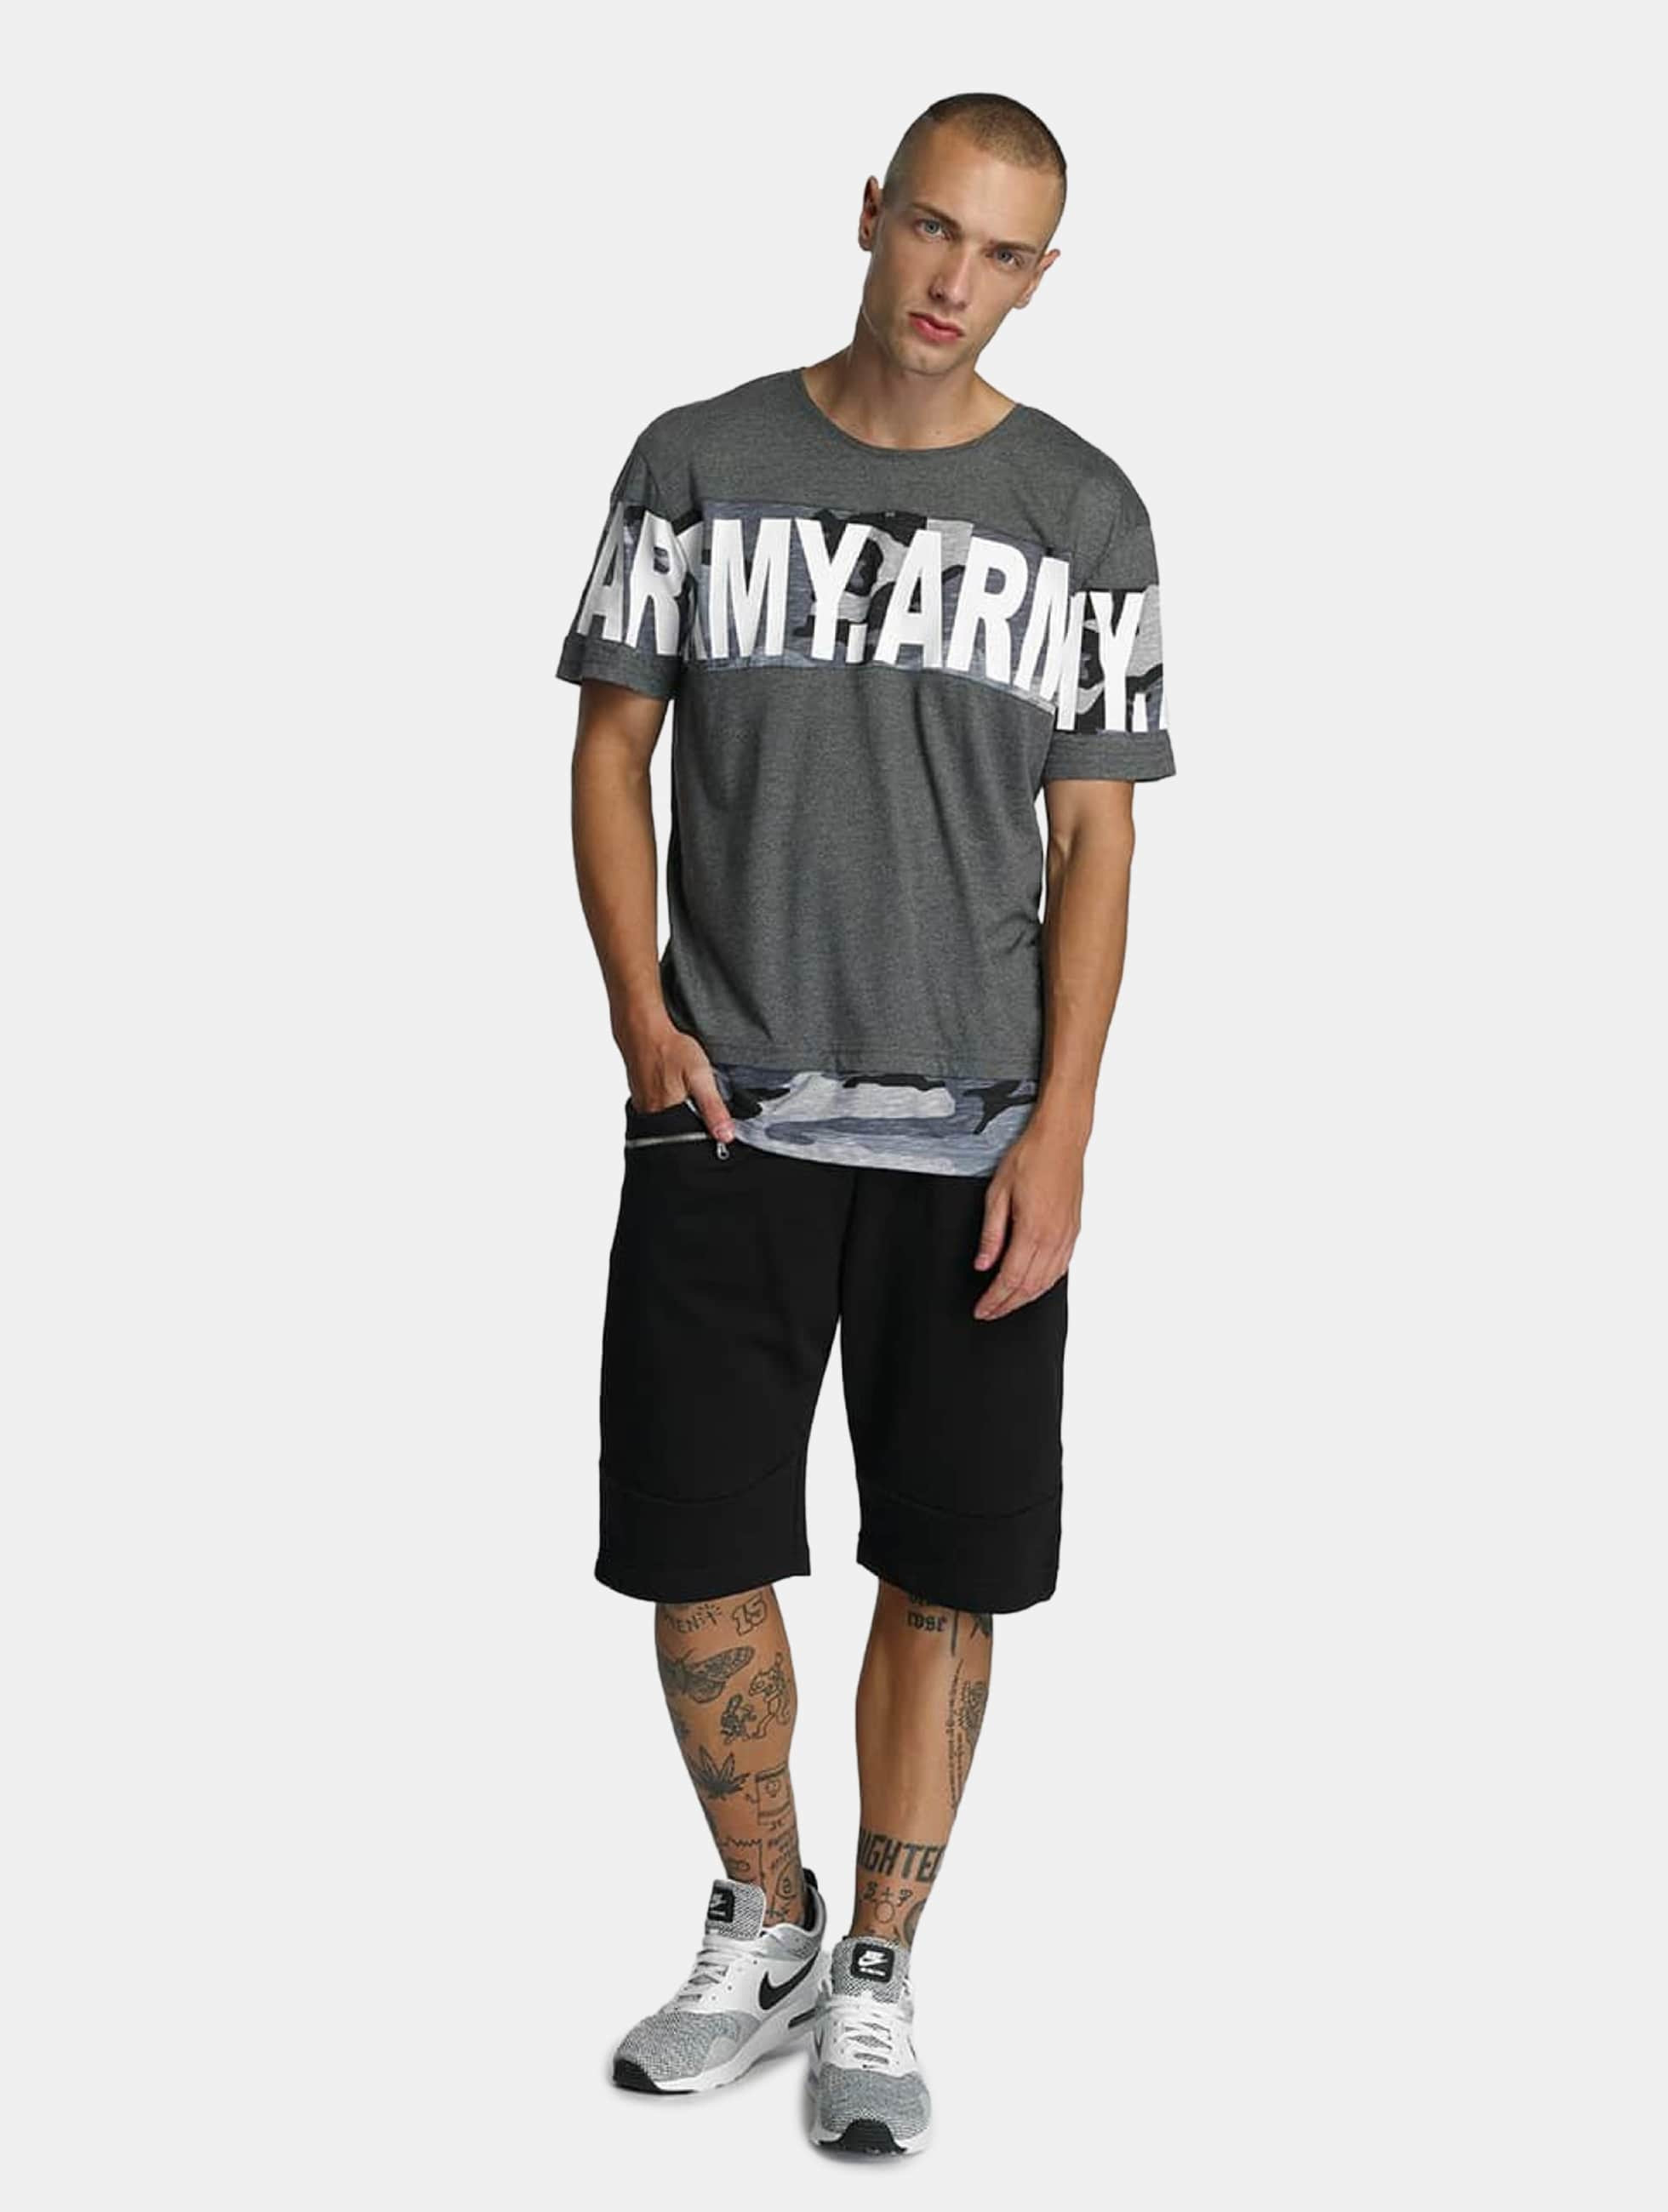 Bangastic-Uomini-Maglieria-T-shirt-Army